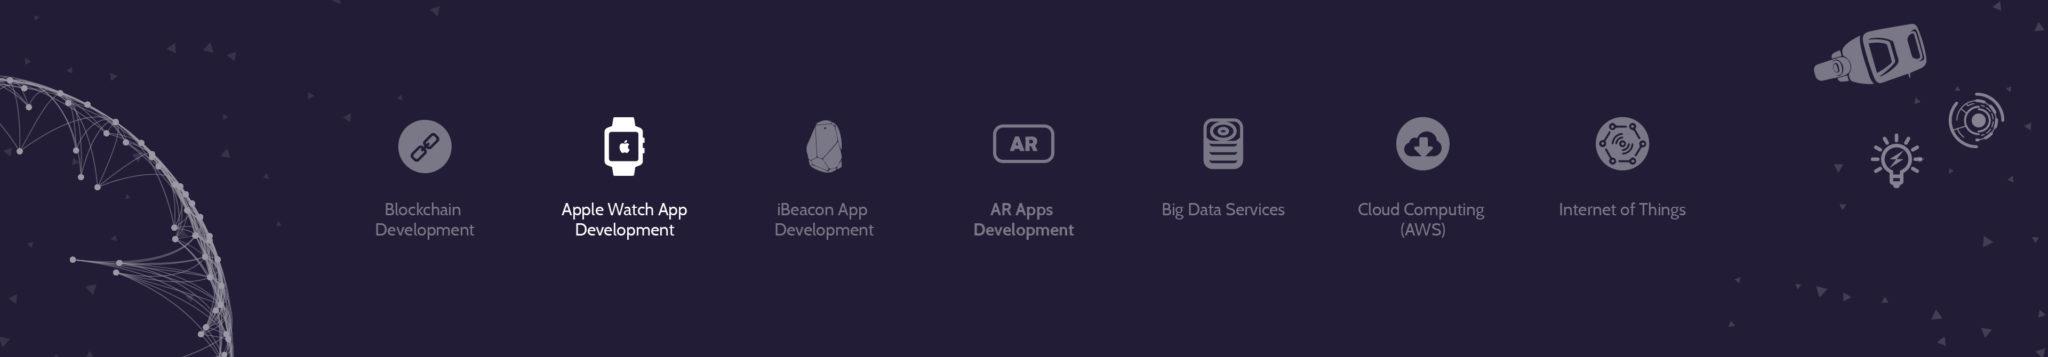 apple-watch-development